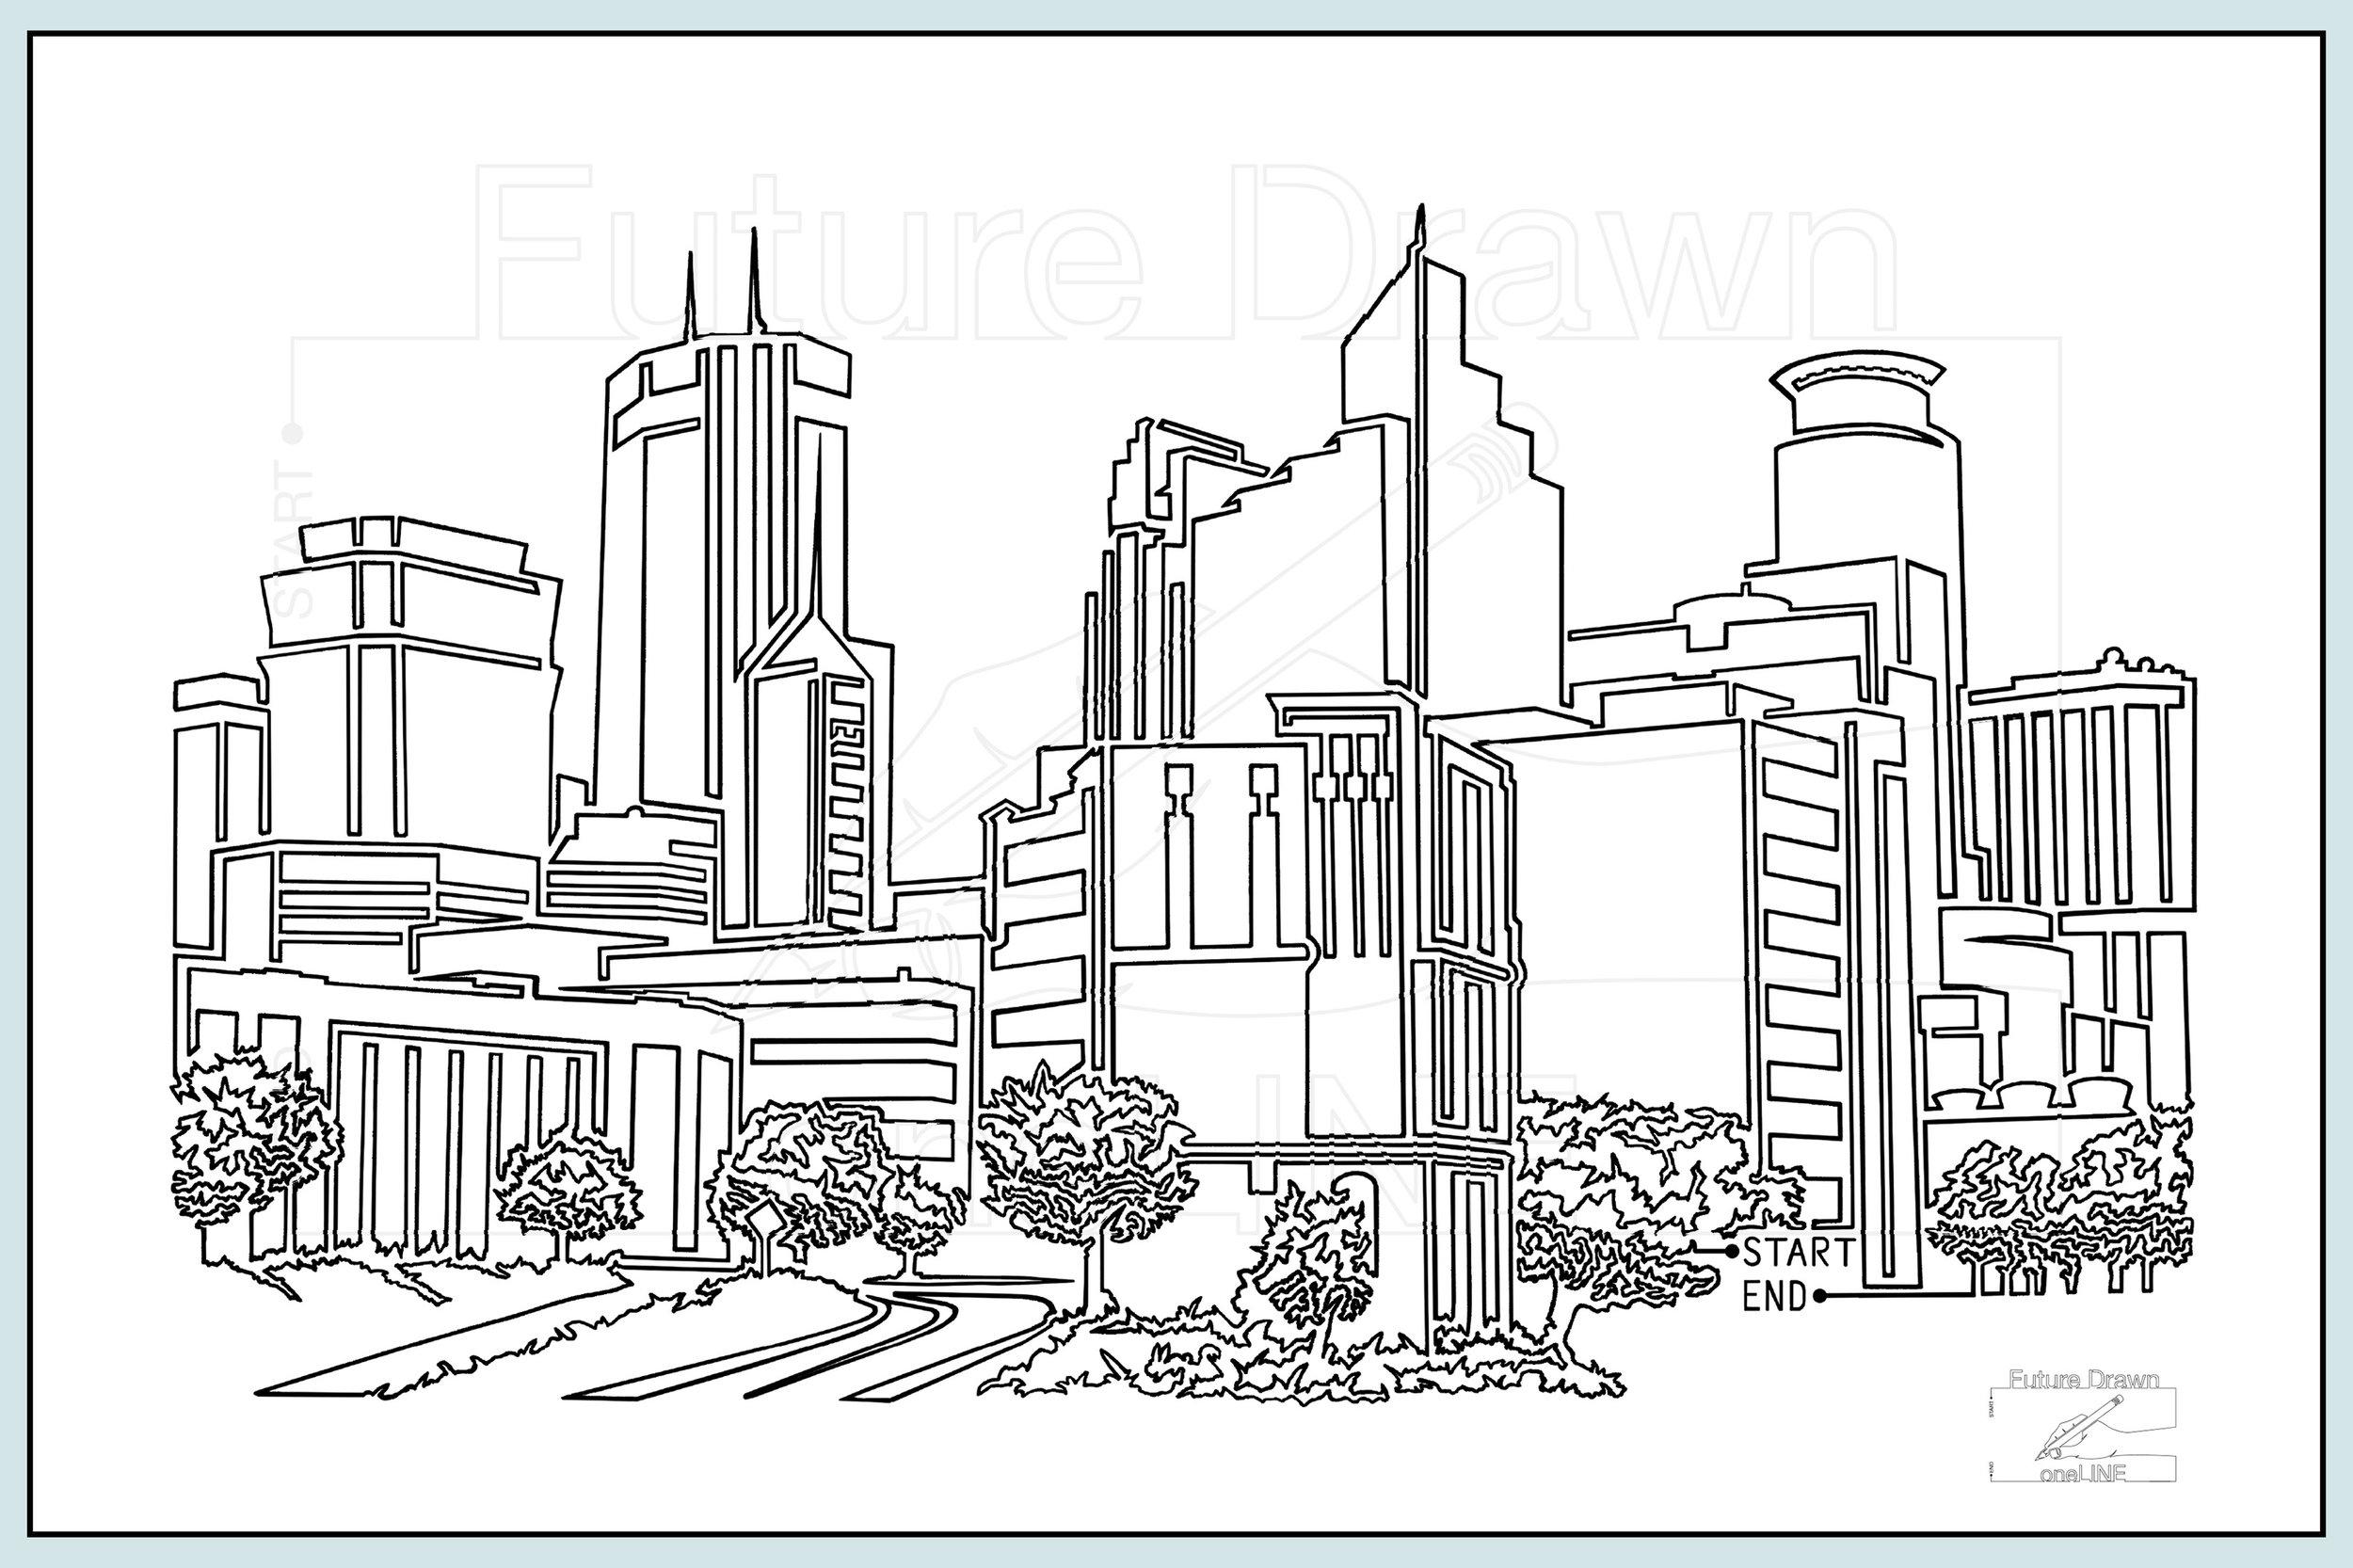 Web-Gallery Item- Miniapolis Skyline- oneLINE Future Drawn Applegate.jpg